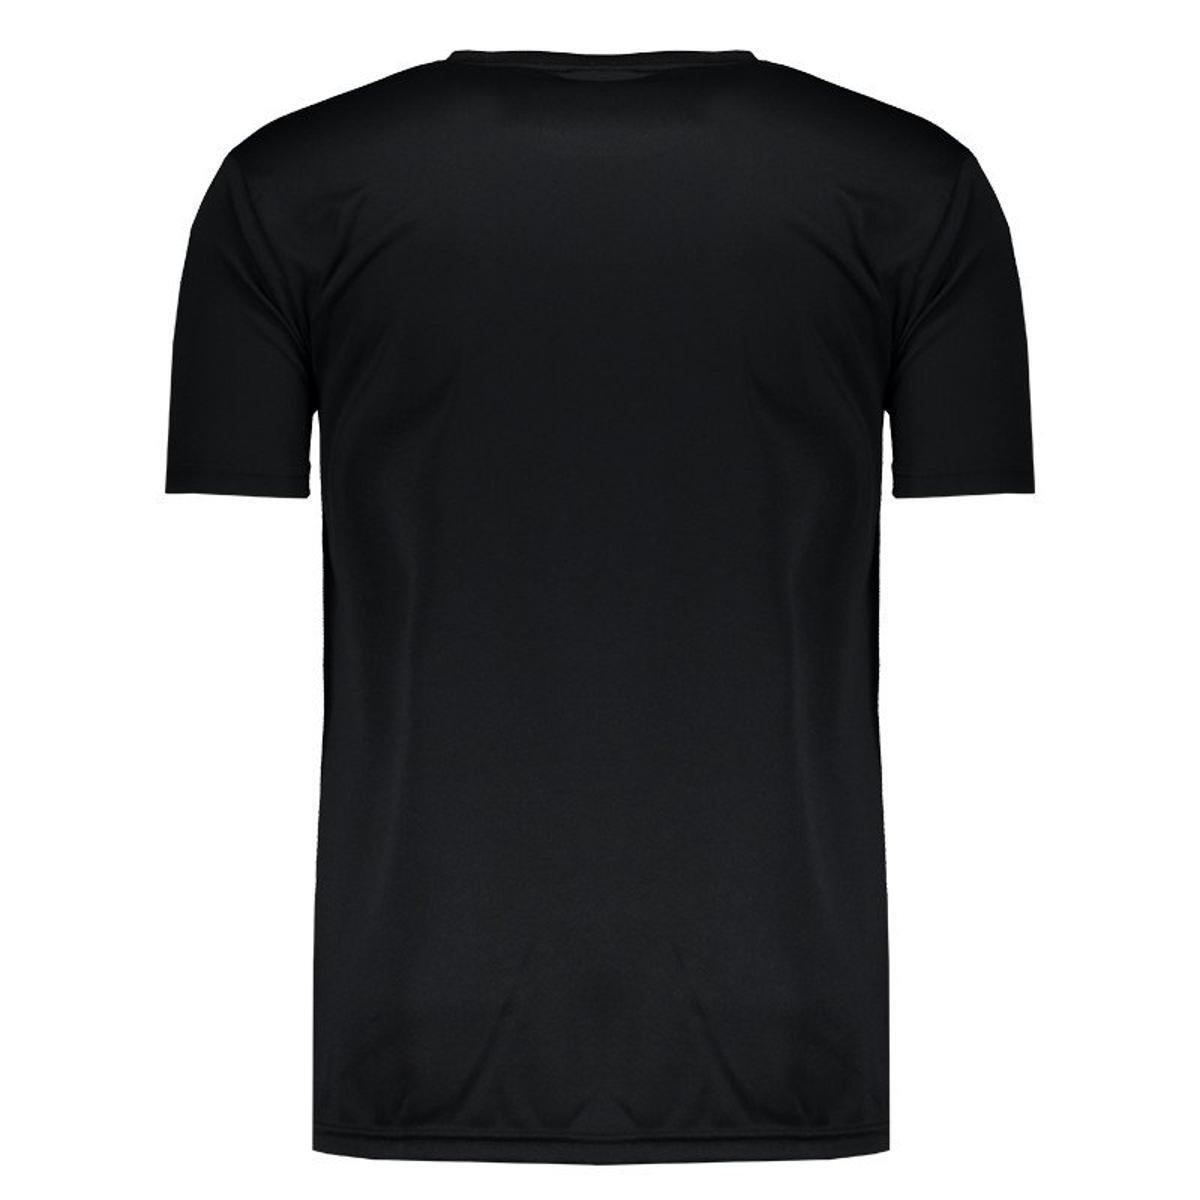 Camiseta Corinthians Davis Masculina - Preto - Compre Agora  fc79355c34a55